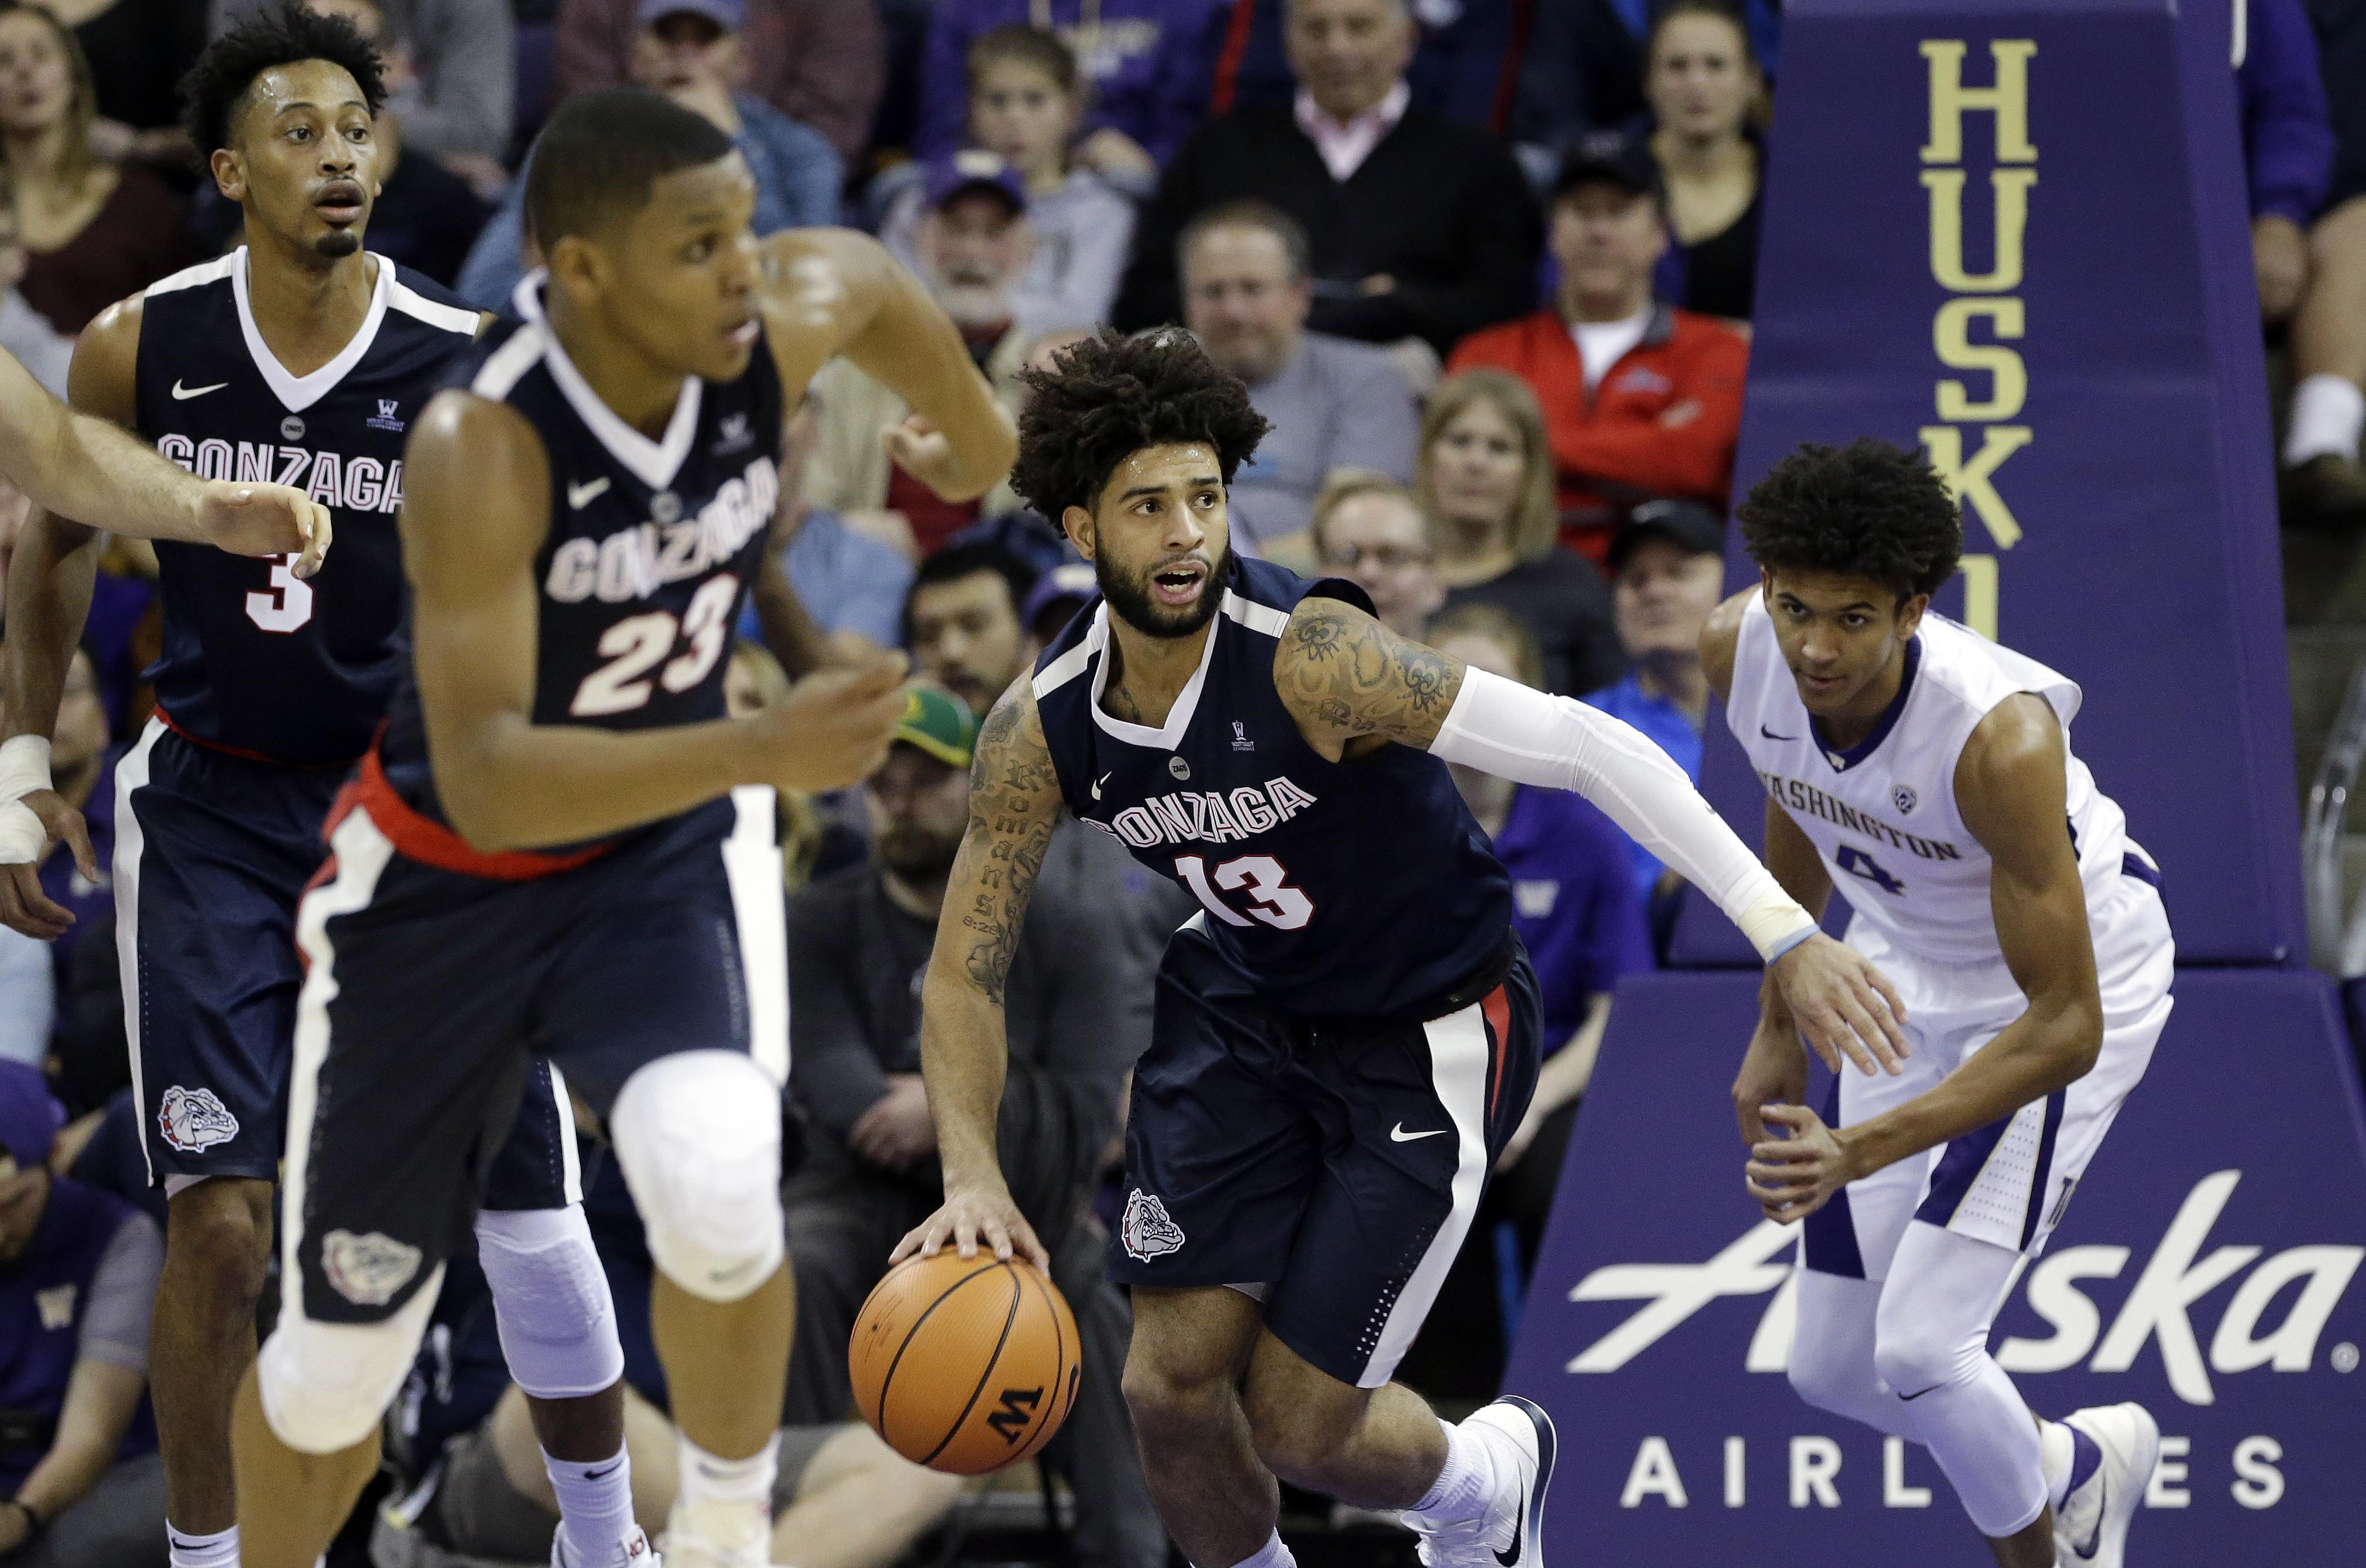 gonzaga adds idaho state, ut arlington to men's basketball schedule